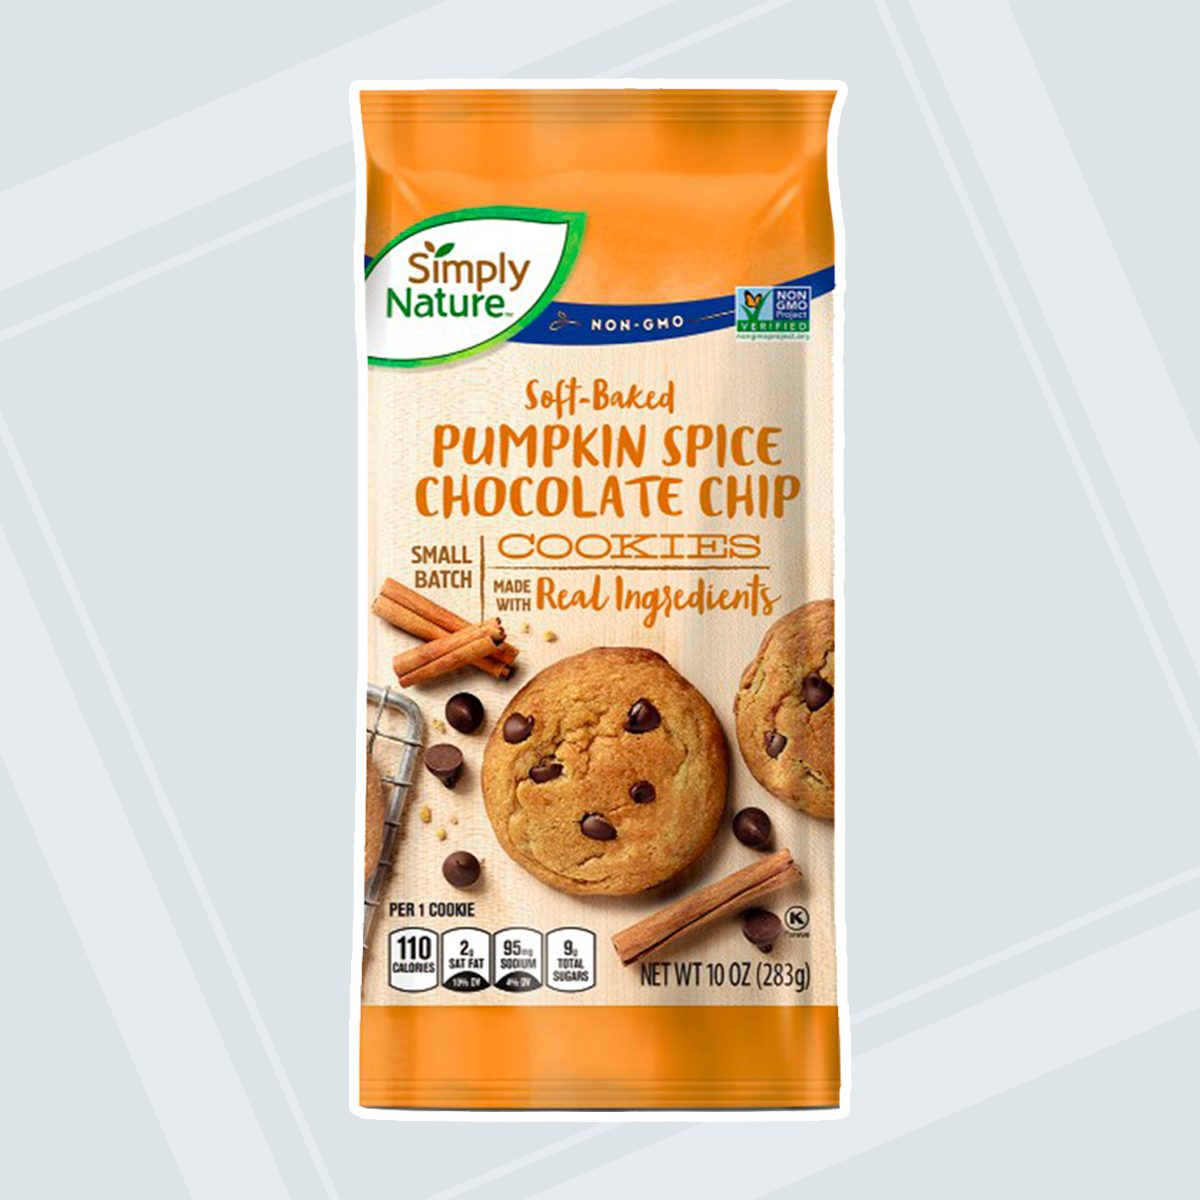 Aldi Pumpkin Spice Chocolate Chip Cookies